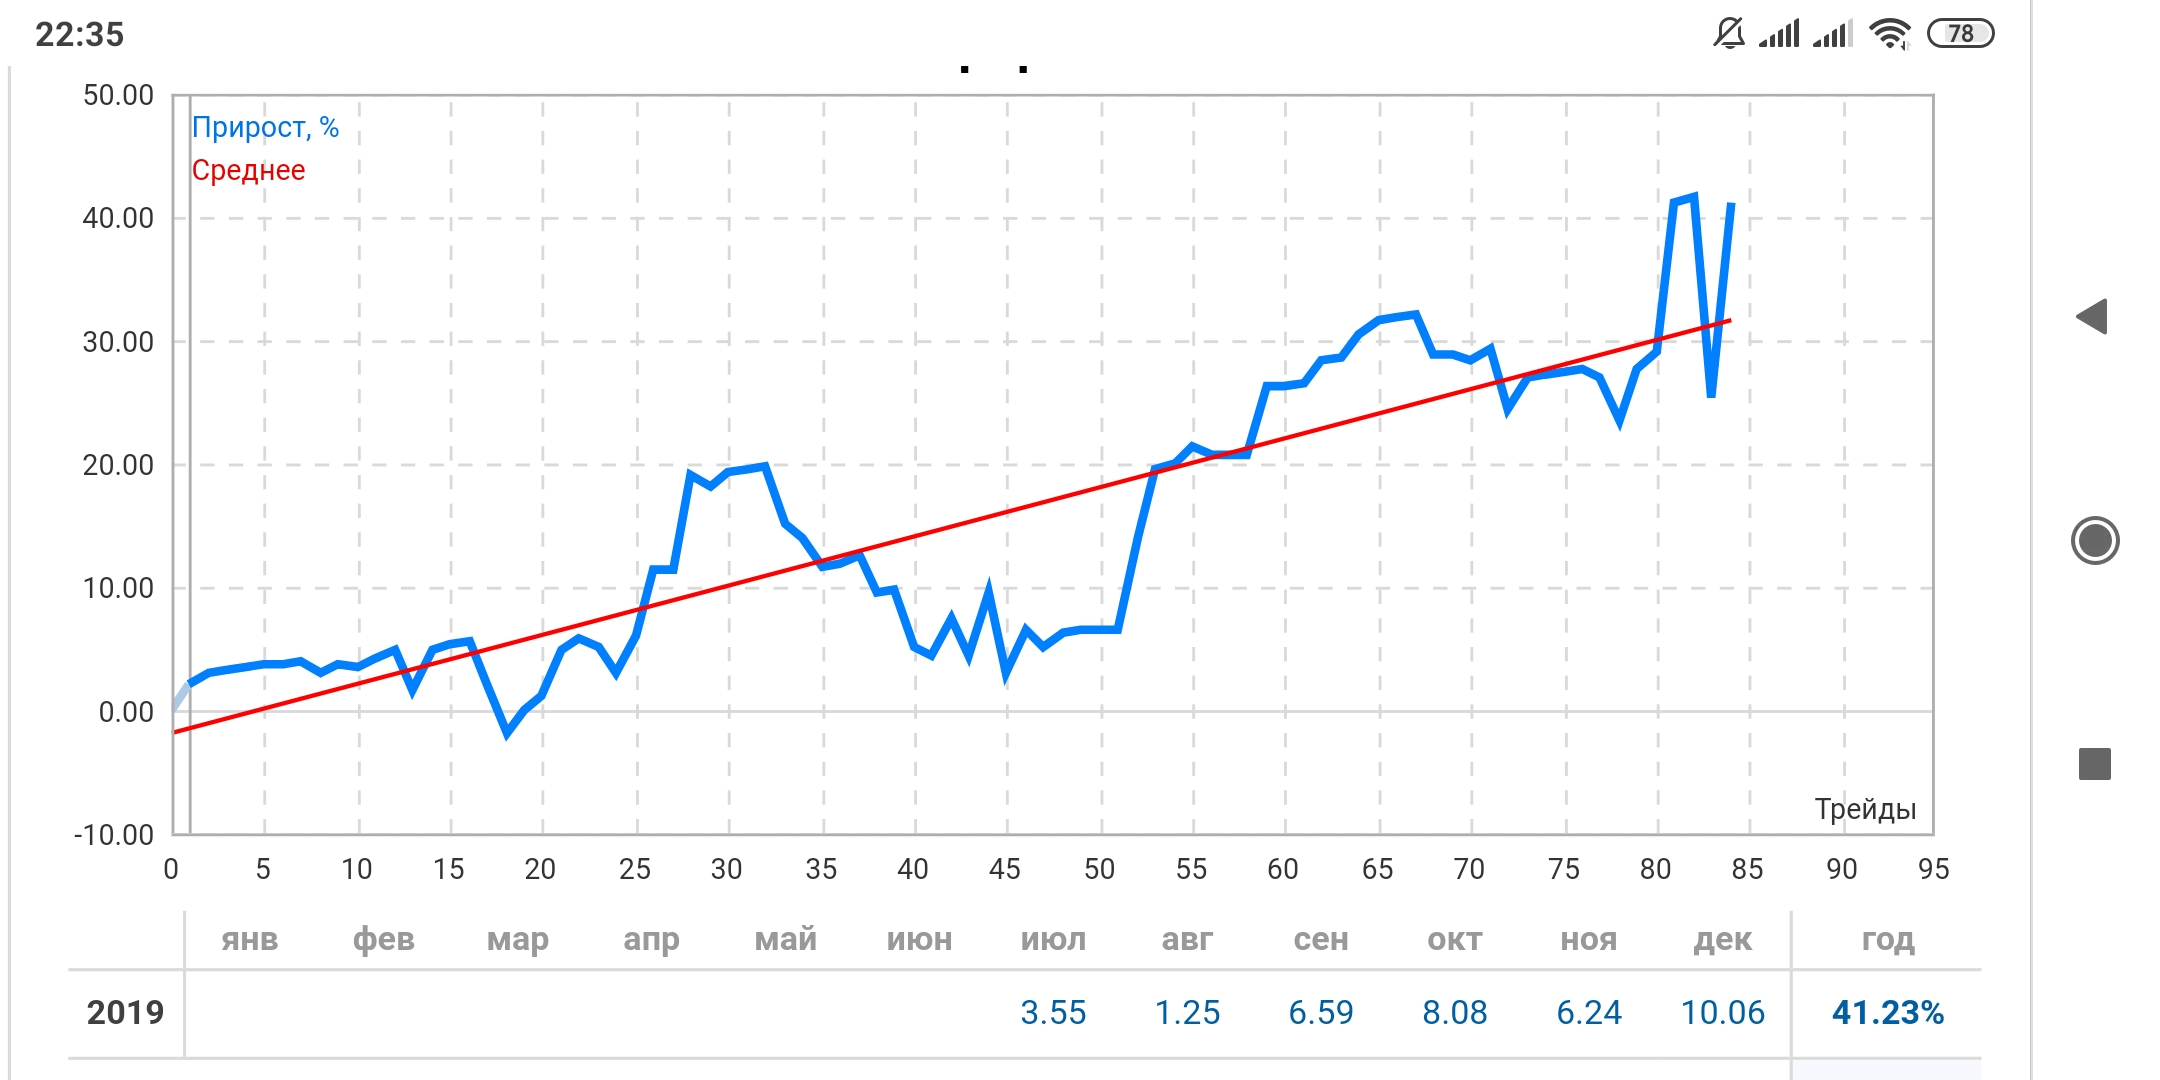 VIK Trand Impuls - советник трендовый. В структуру анализа входит: · Тренд · Импульс · Откат · Фильтр · Вход https://www.mql5.com/ru/market/product/36503 Торговый сигнал https://www.mql5.com/ru/signals/611065